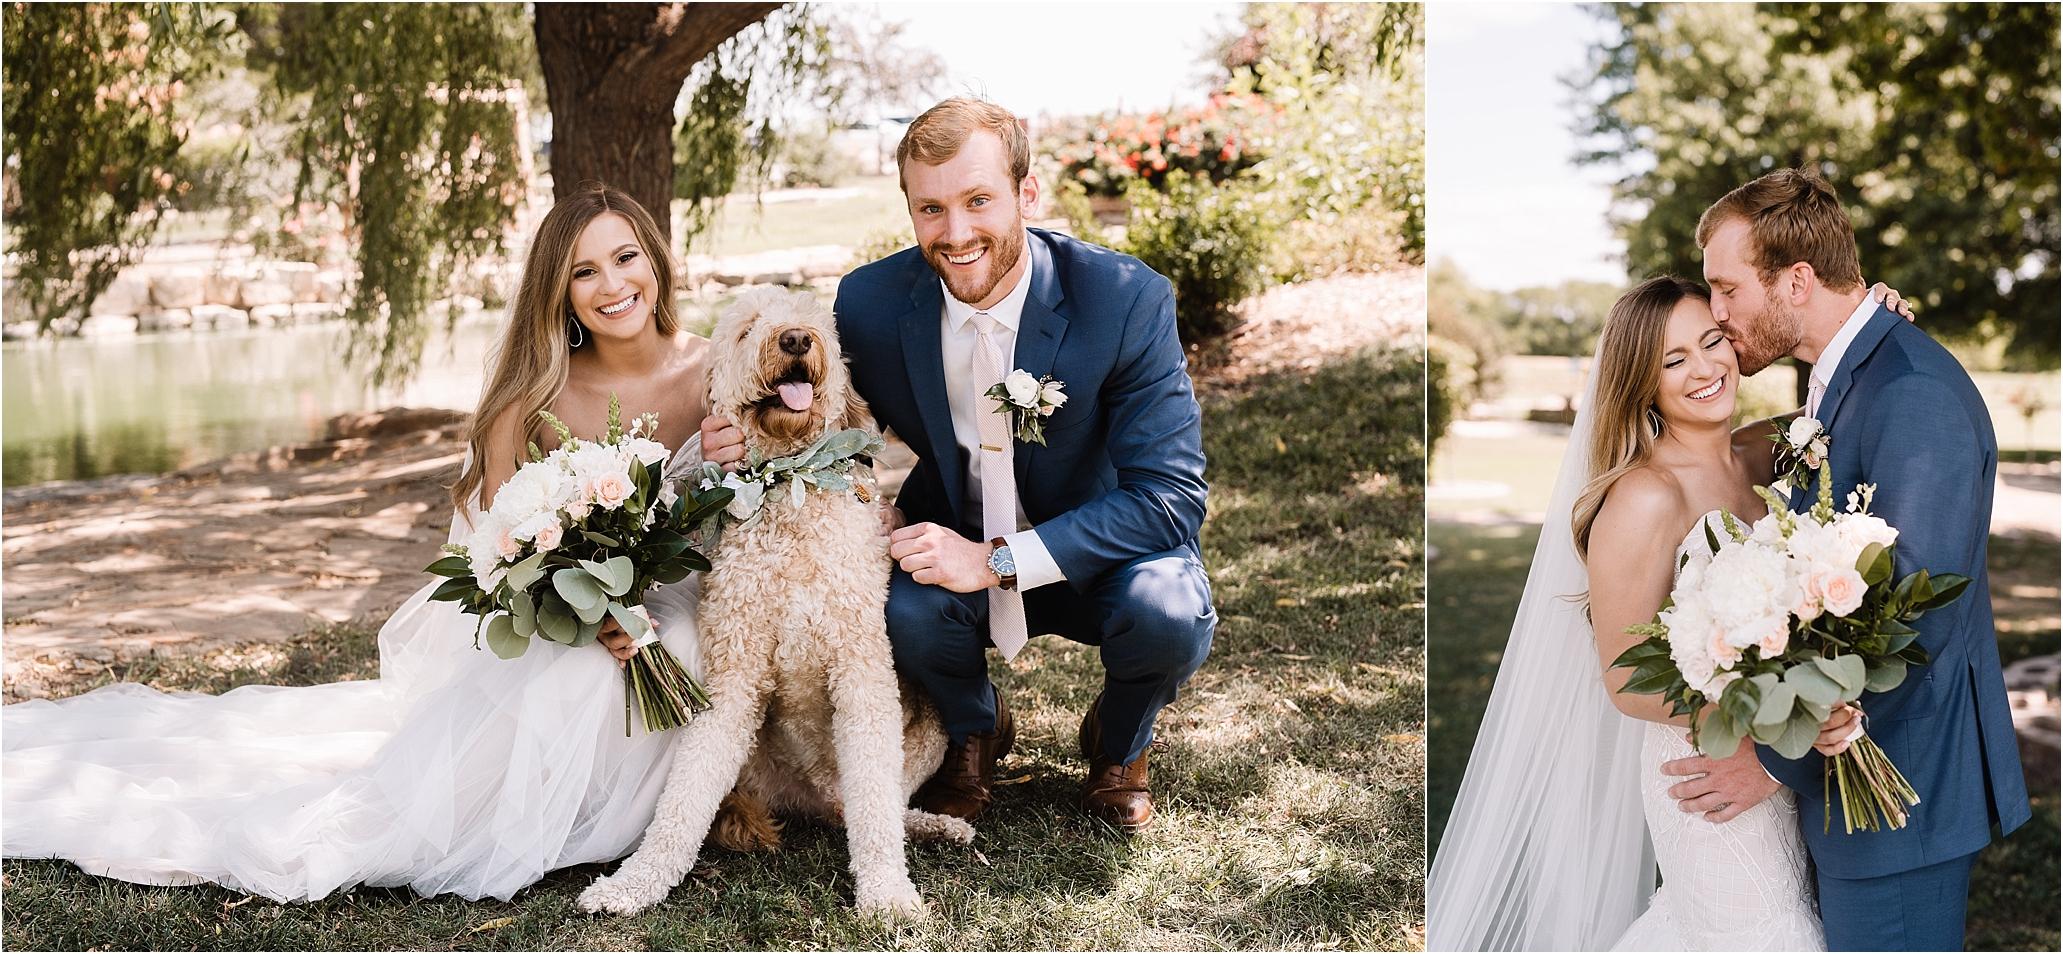 oklahoma wedding photographer bride groom wedding day outside wichita wedding photographer bridal bouquet blue suit dog pet goldendoodle